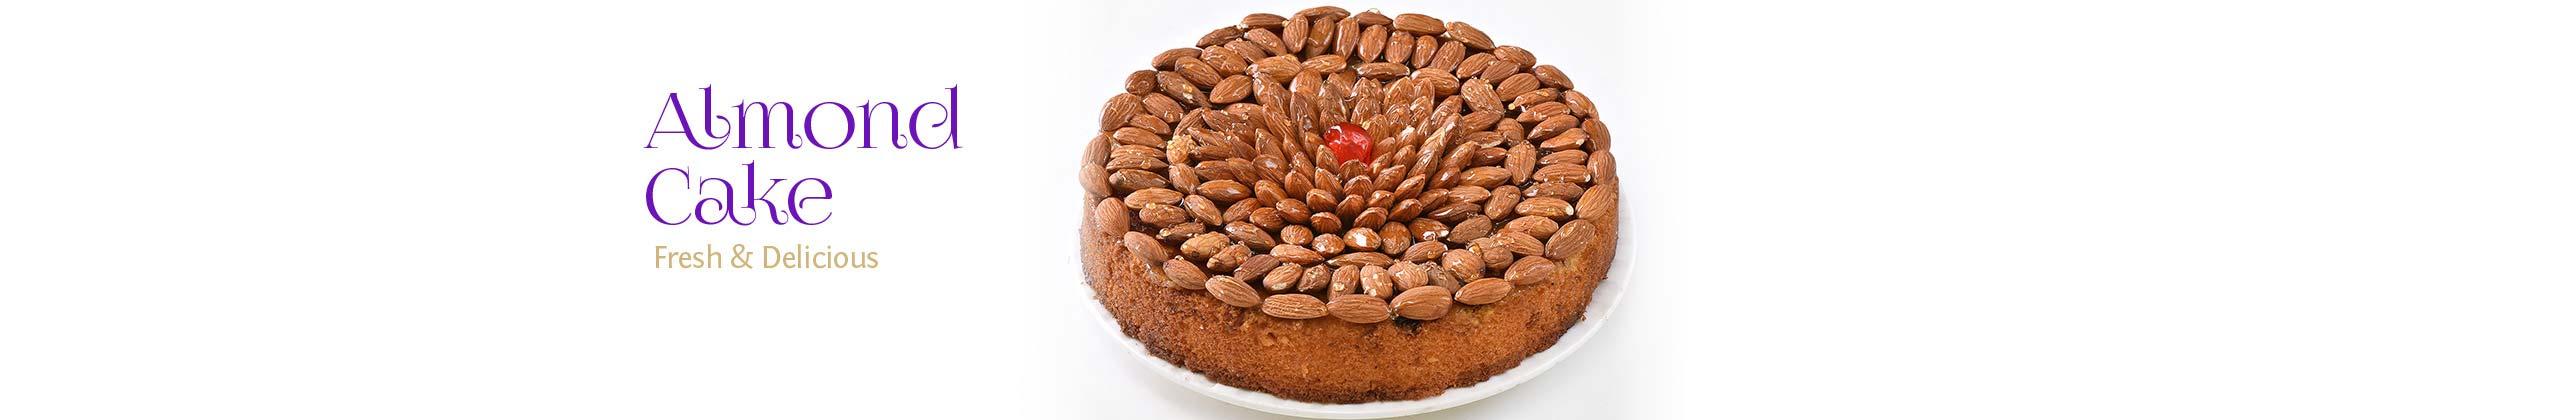 3-Almond-Cake